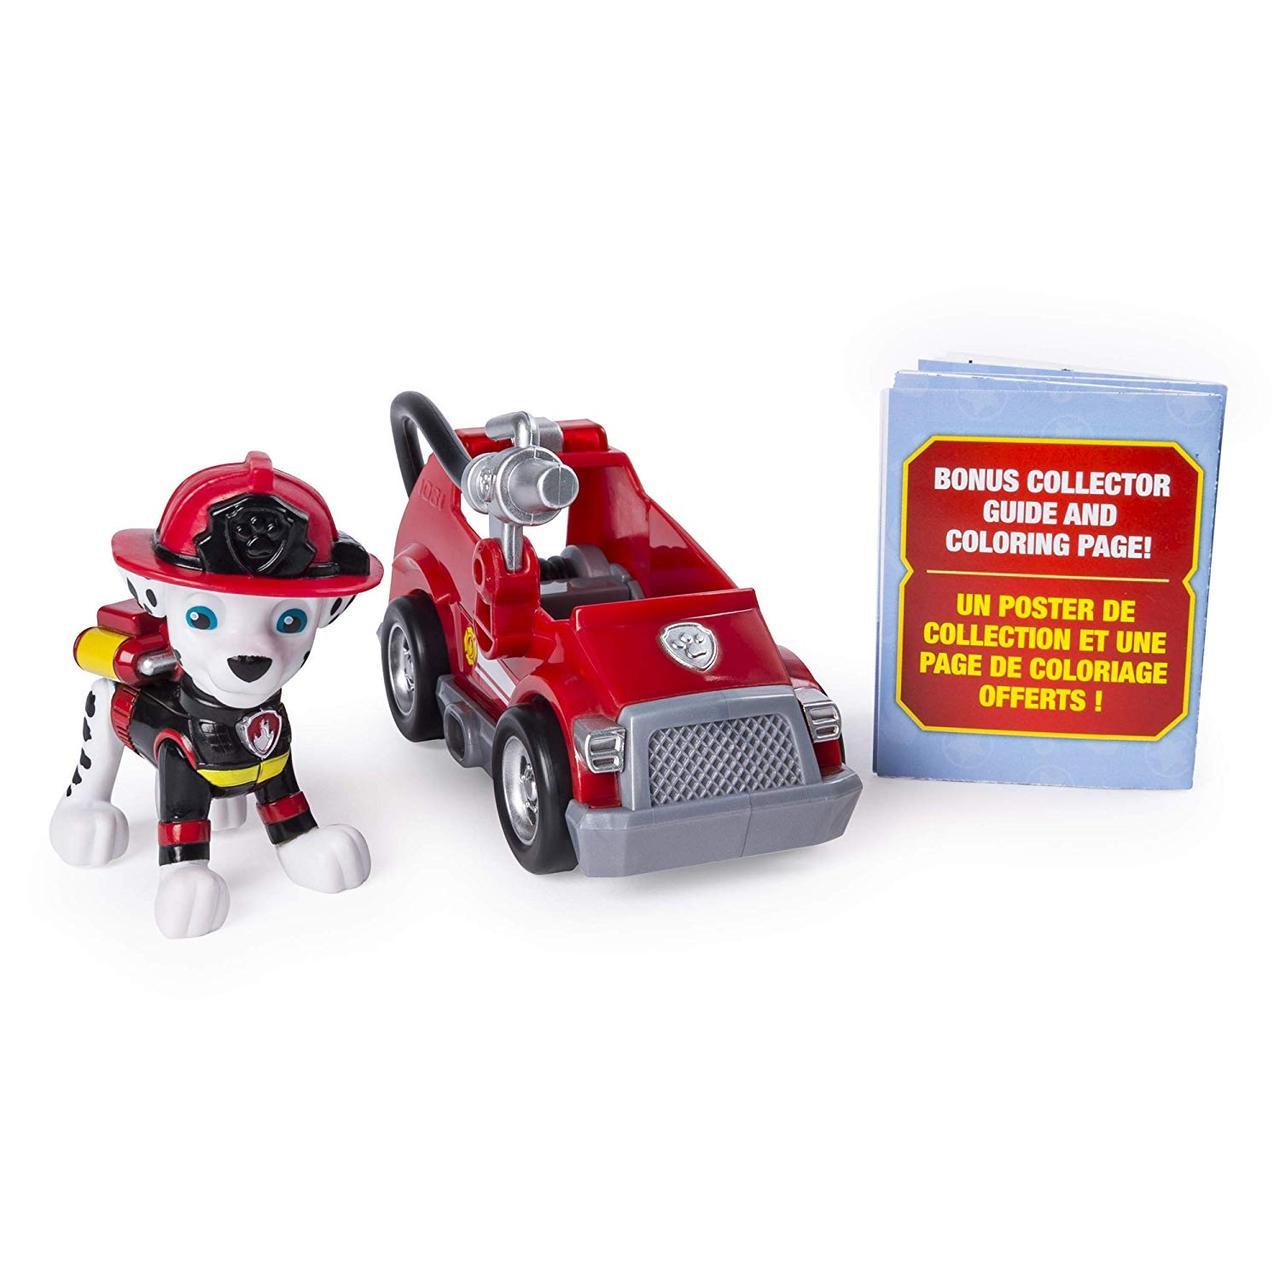 Щенячий патруль Маршал мини пожарная машина PAW Patrol Ultimate Rescue Marshall's Mini Fire Cart